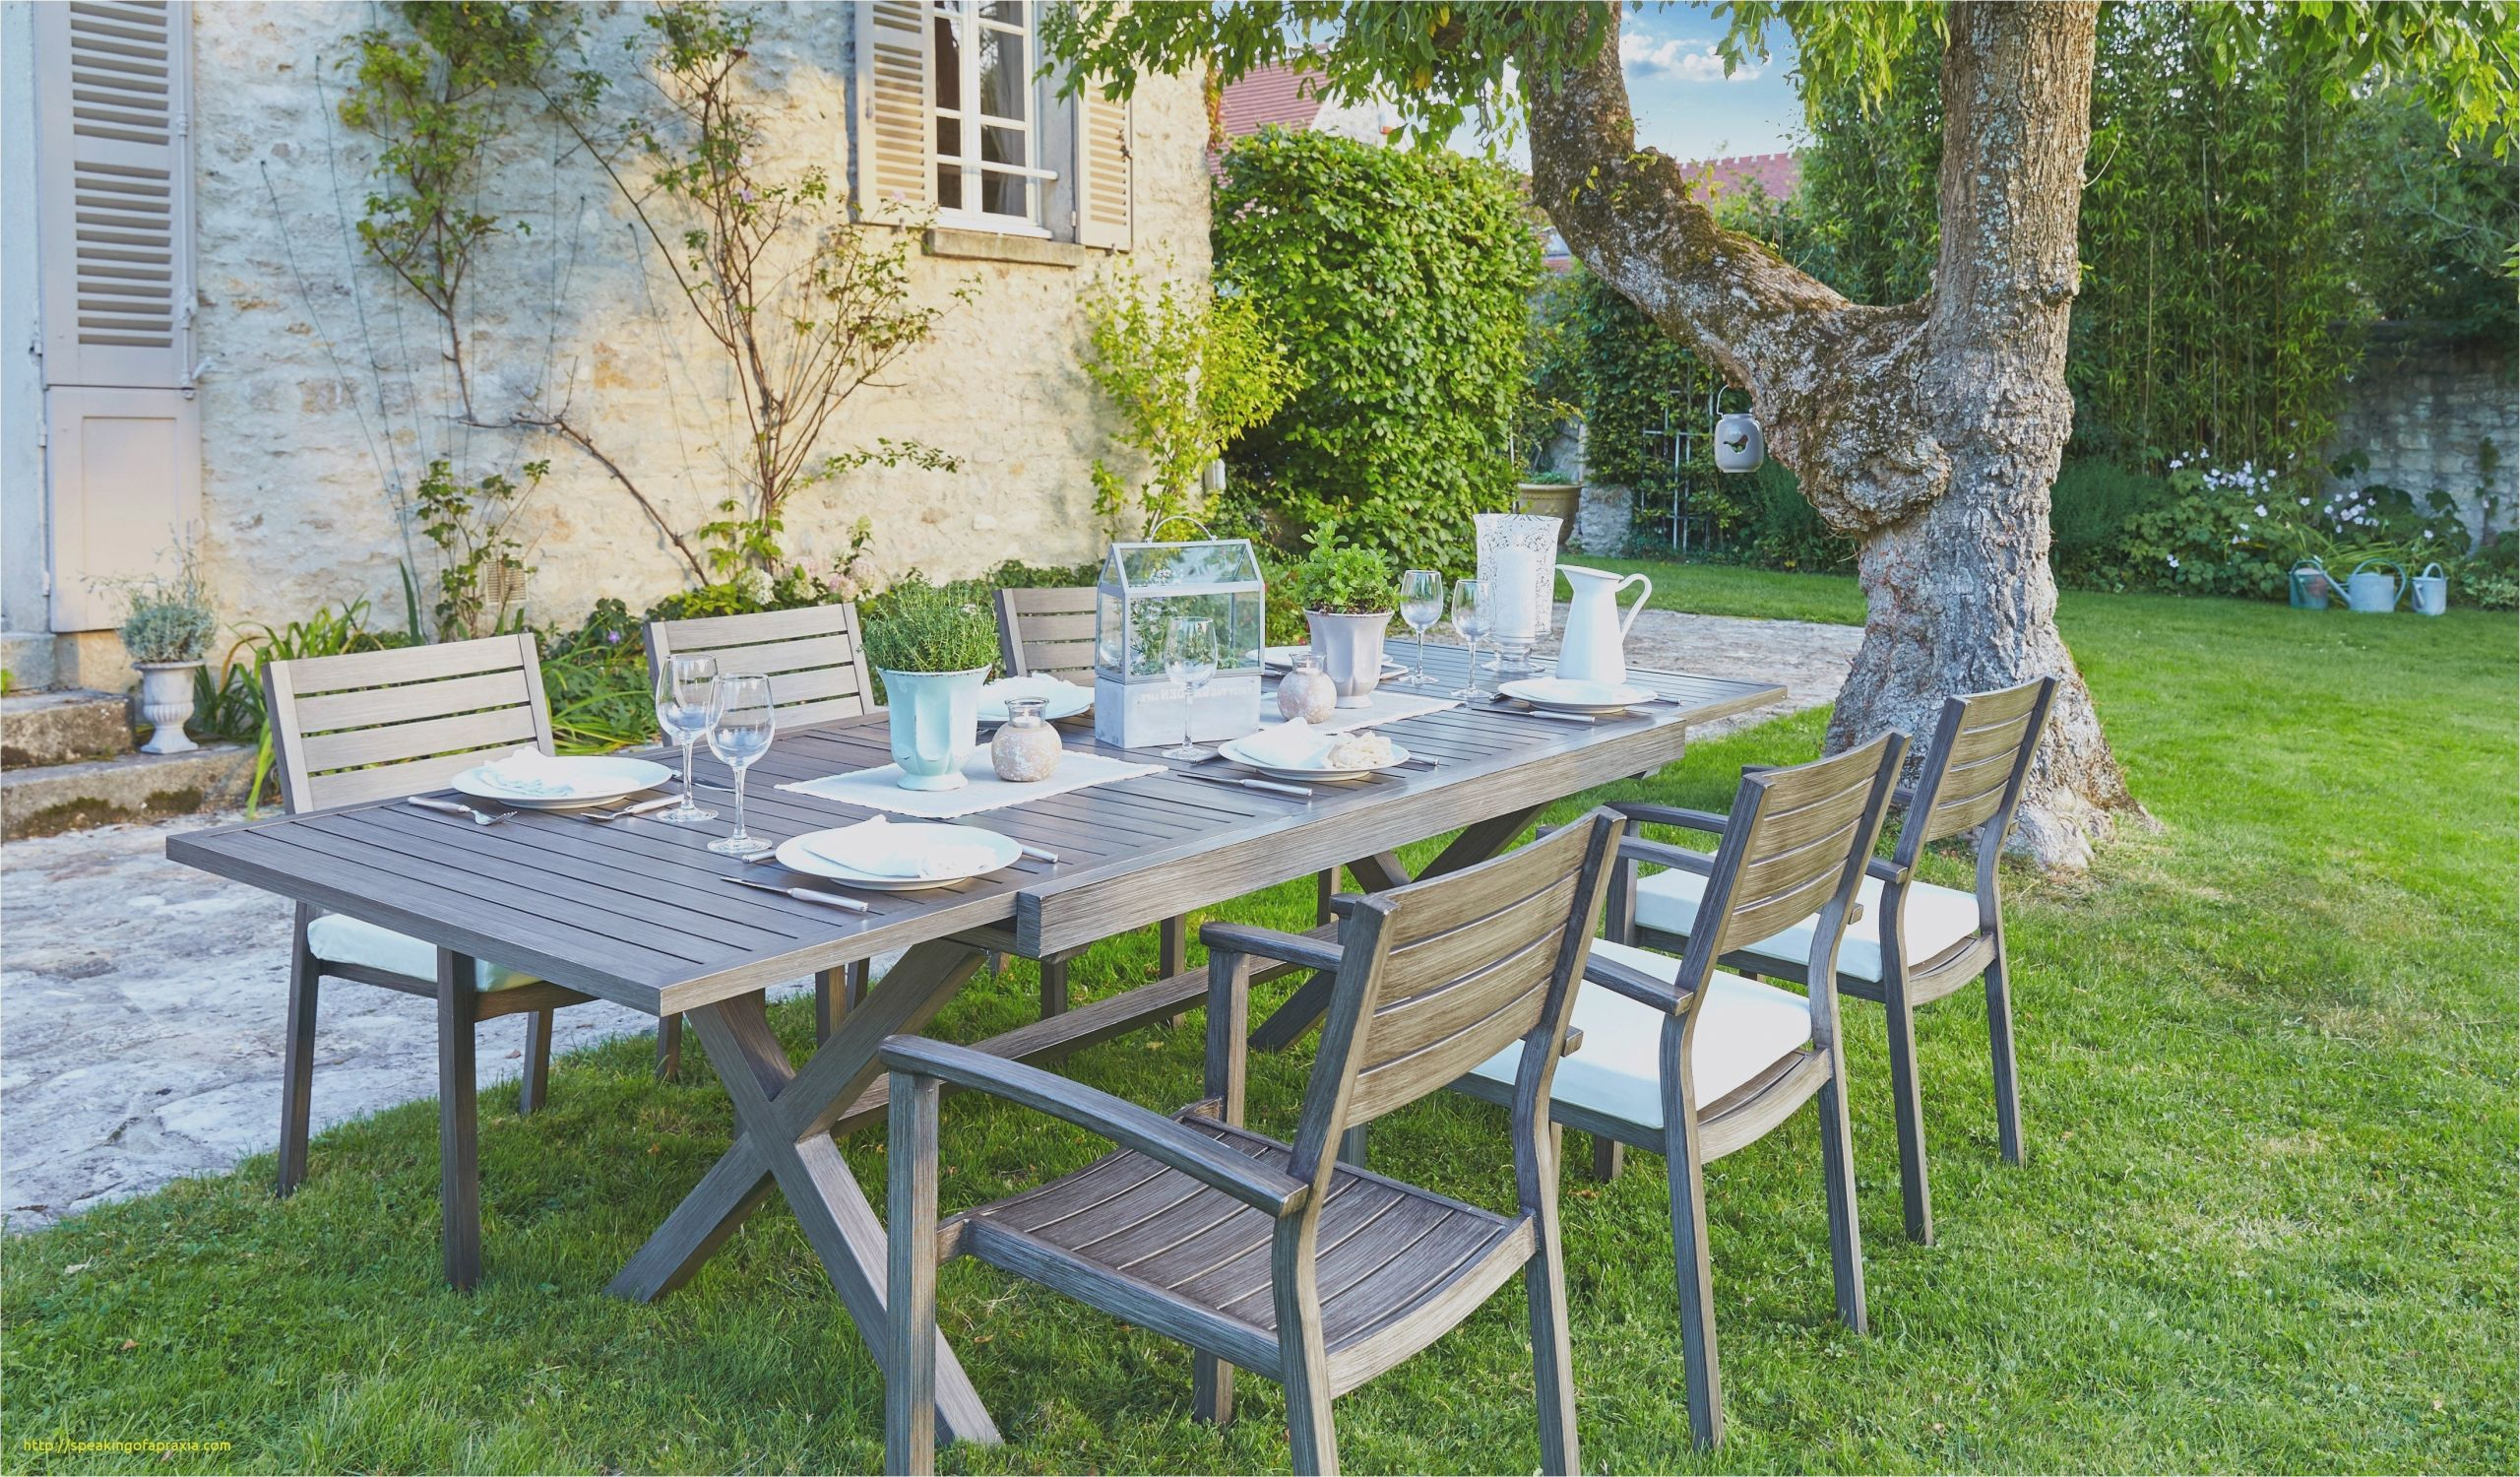 40 Inspirant Table Exterieur Carrefour   Salon Jardin tout Table De Jardin Pliante Carrefour